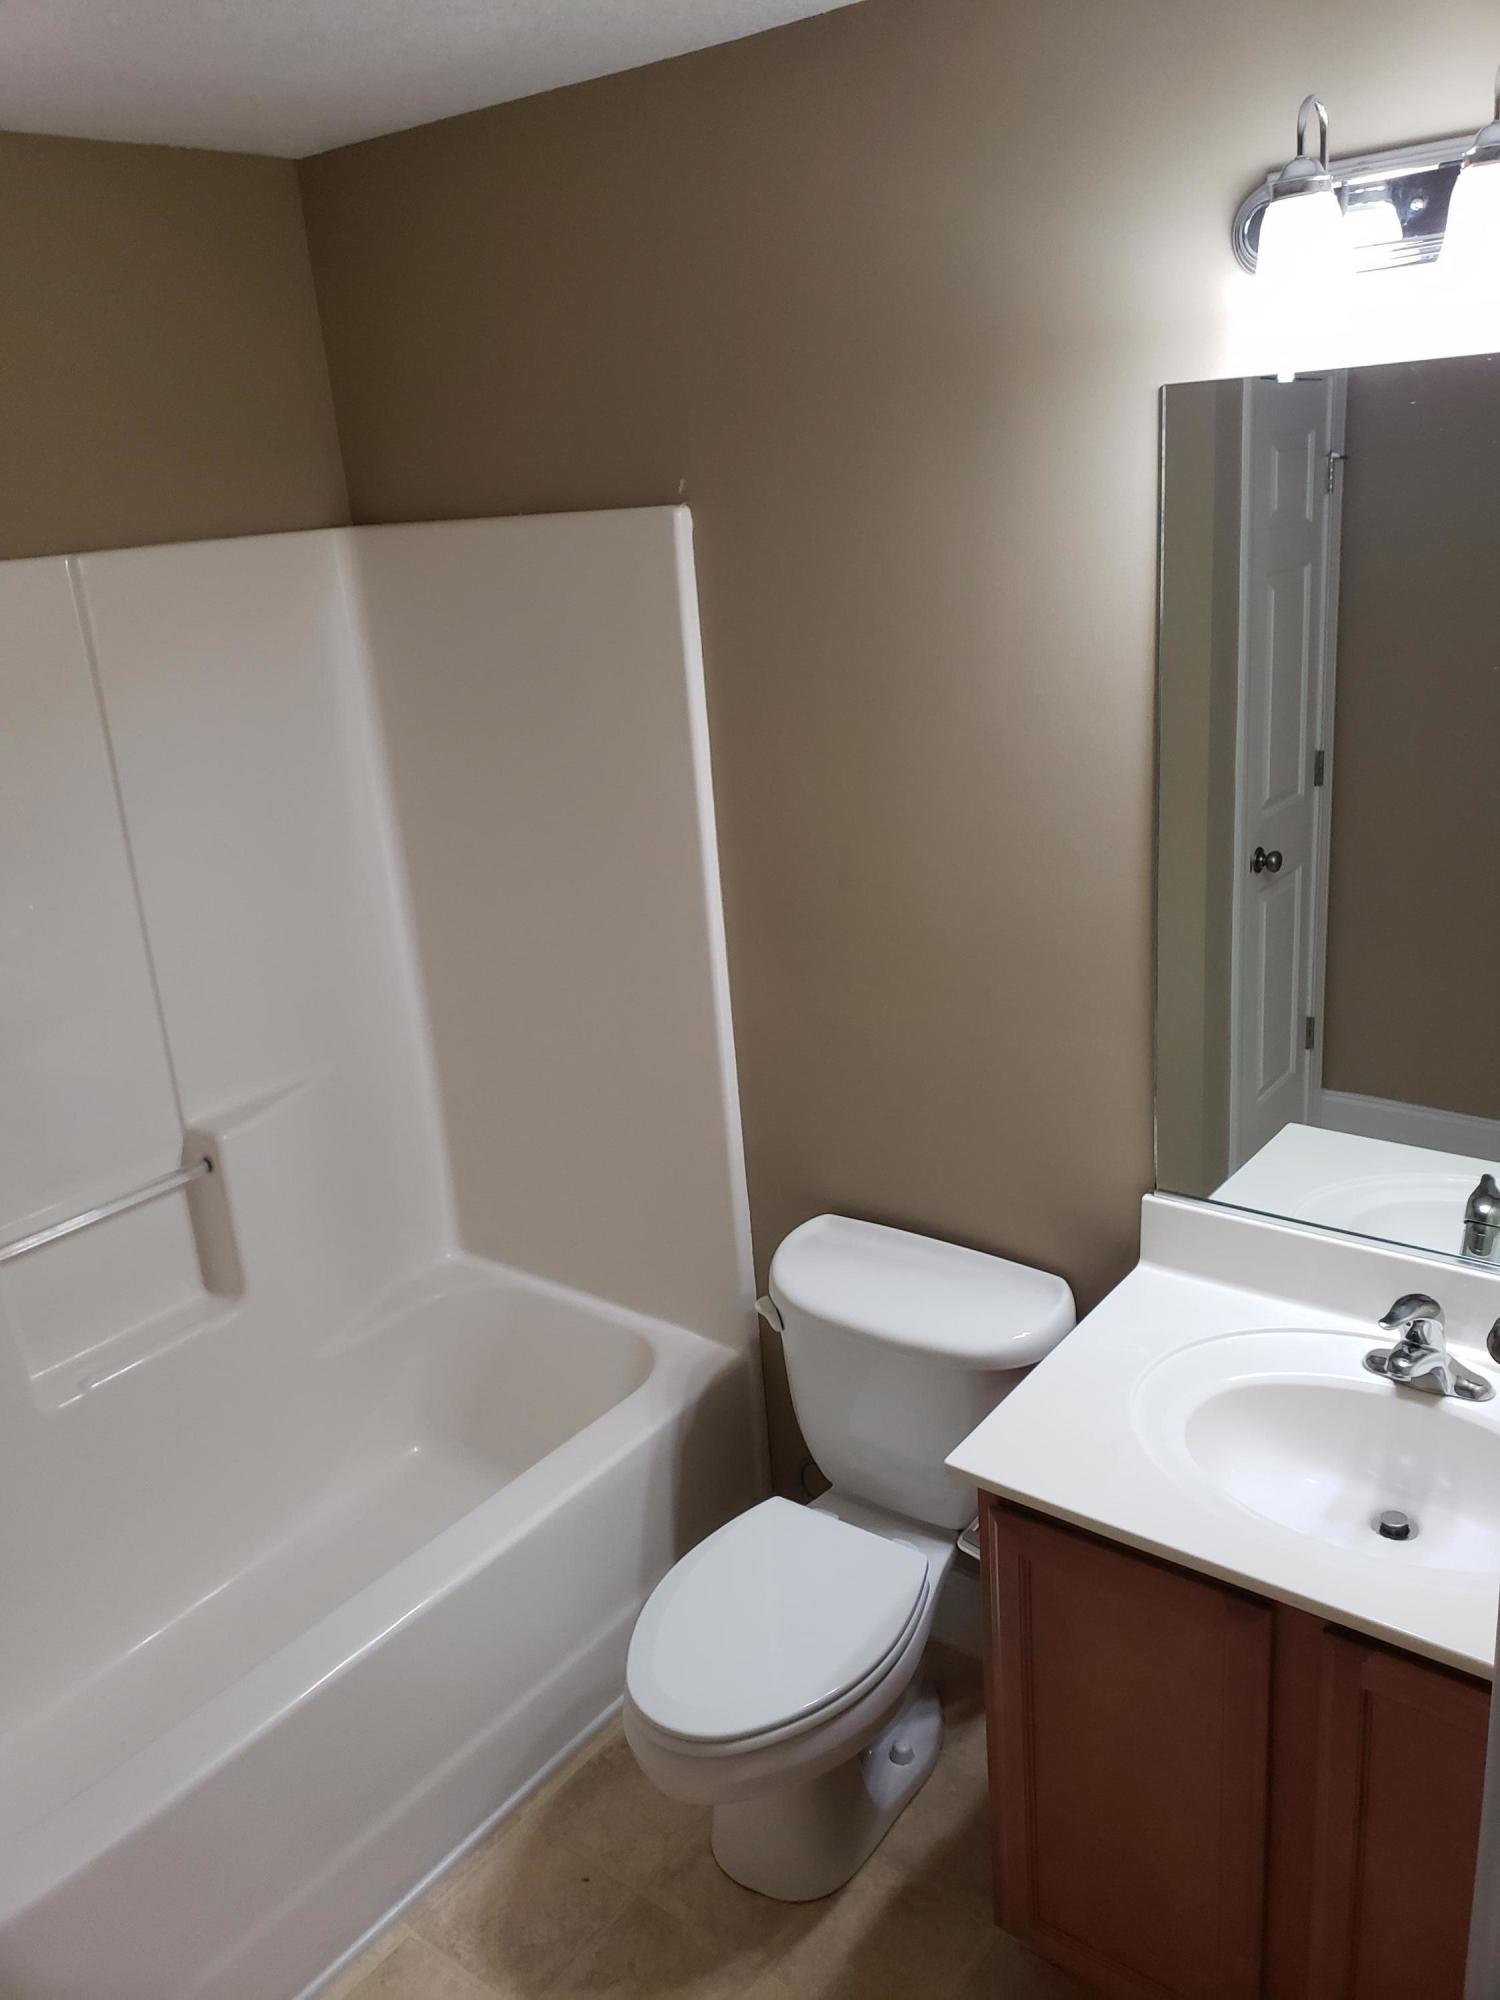 Montague Pointe Homes For Sale - 100 Gavins, Goose Creek, SC - 2